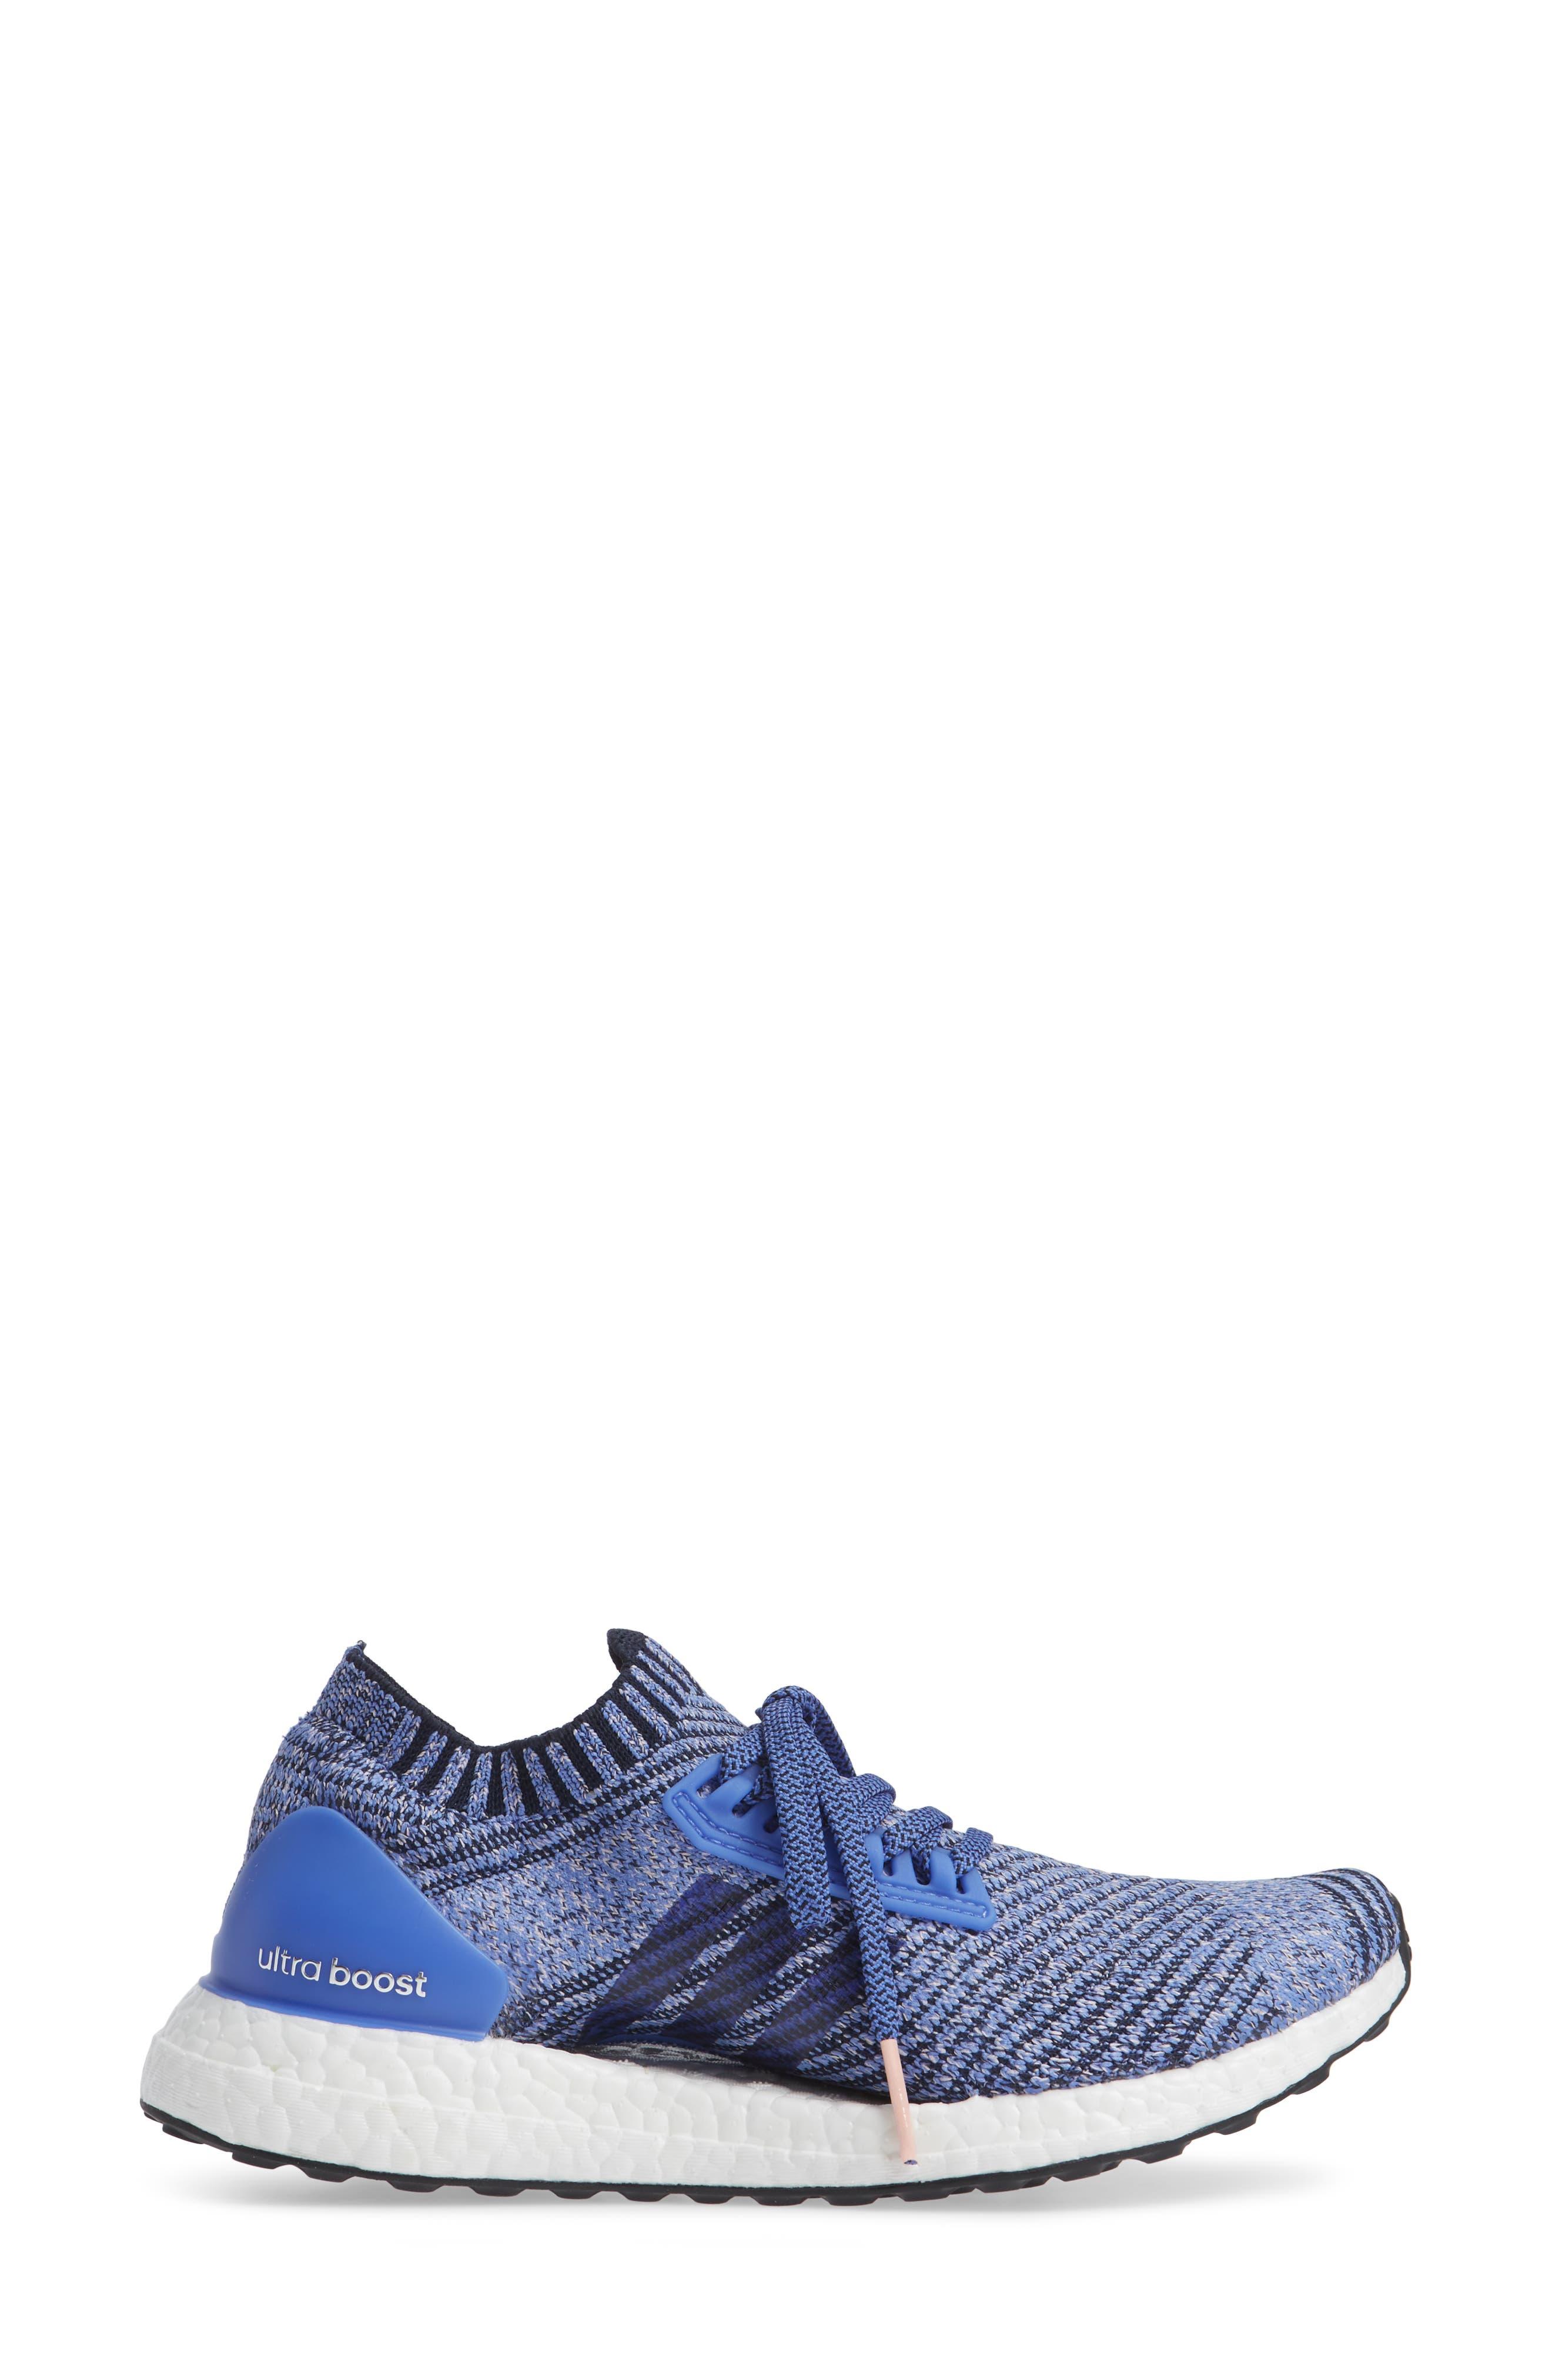 UltraBoost X Running Shoe,                             Alternate thumbnail 3, color,                             REAL LILAC/ LEGEND INK/ BLACK